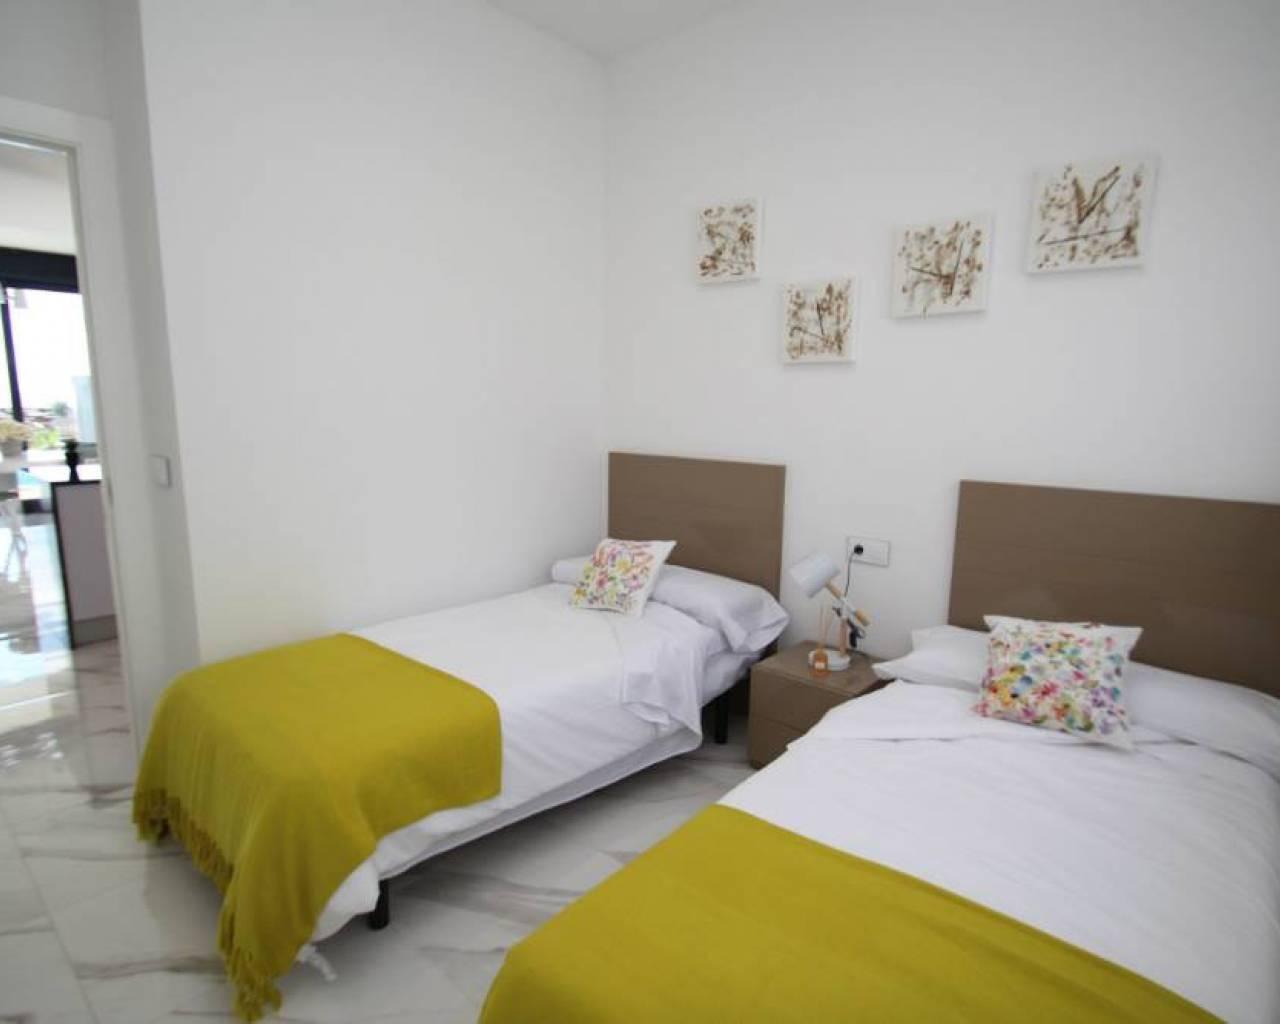 nieuwbouw-appartement-san-miguel-de-salinas_322_xl